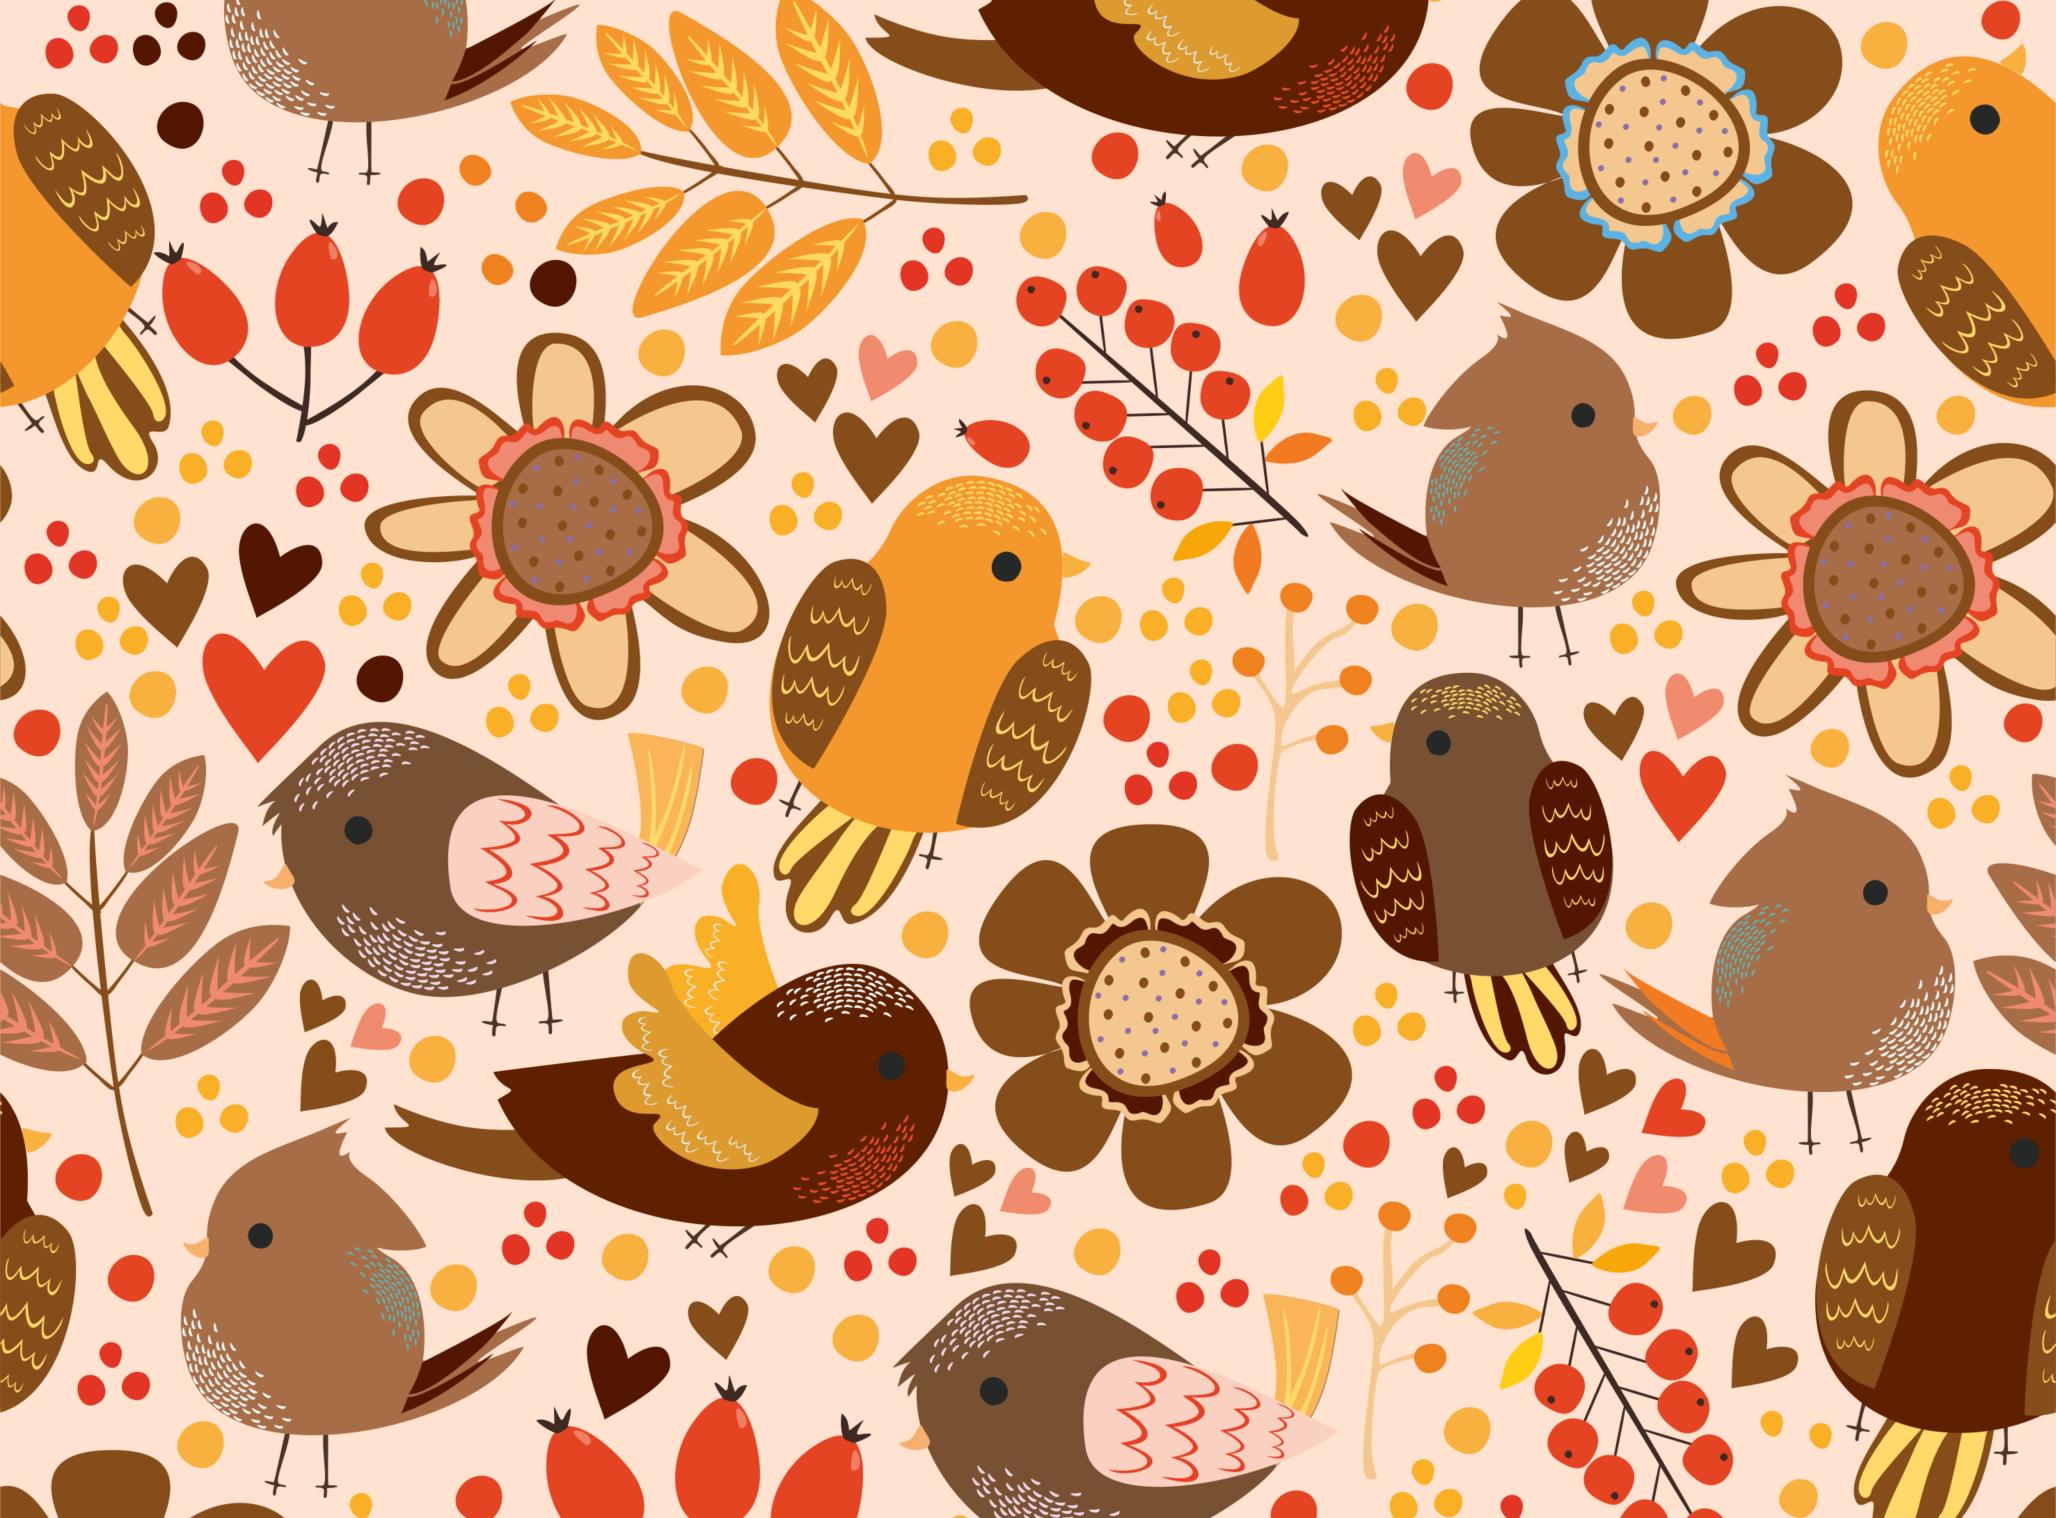 Birds set 2 (vector,jpg,png) example image 4